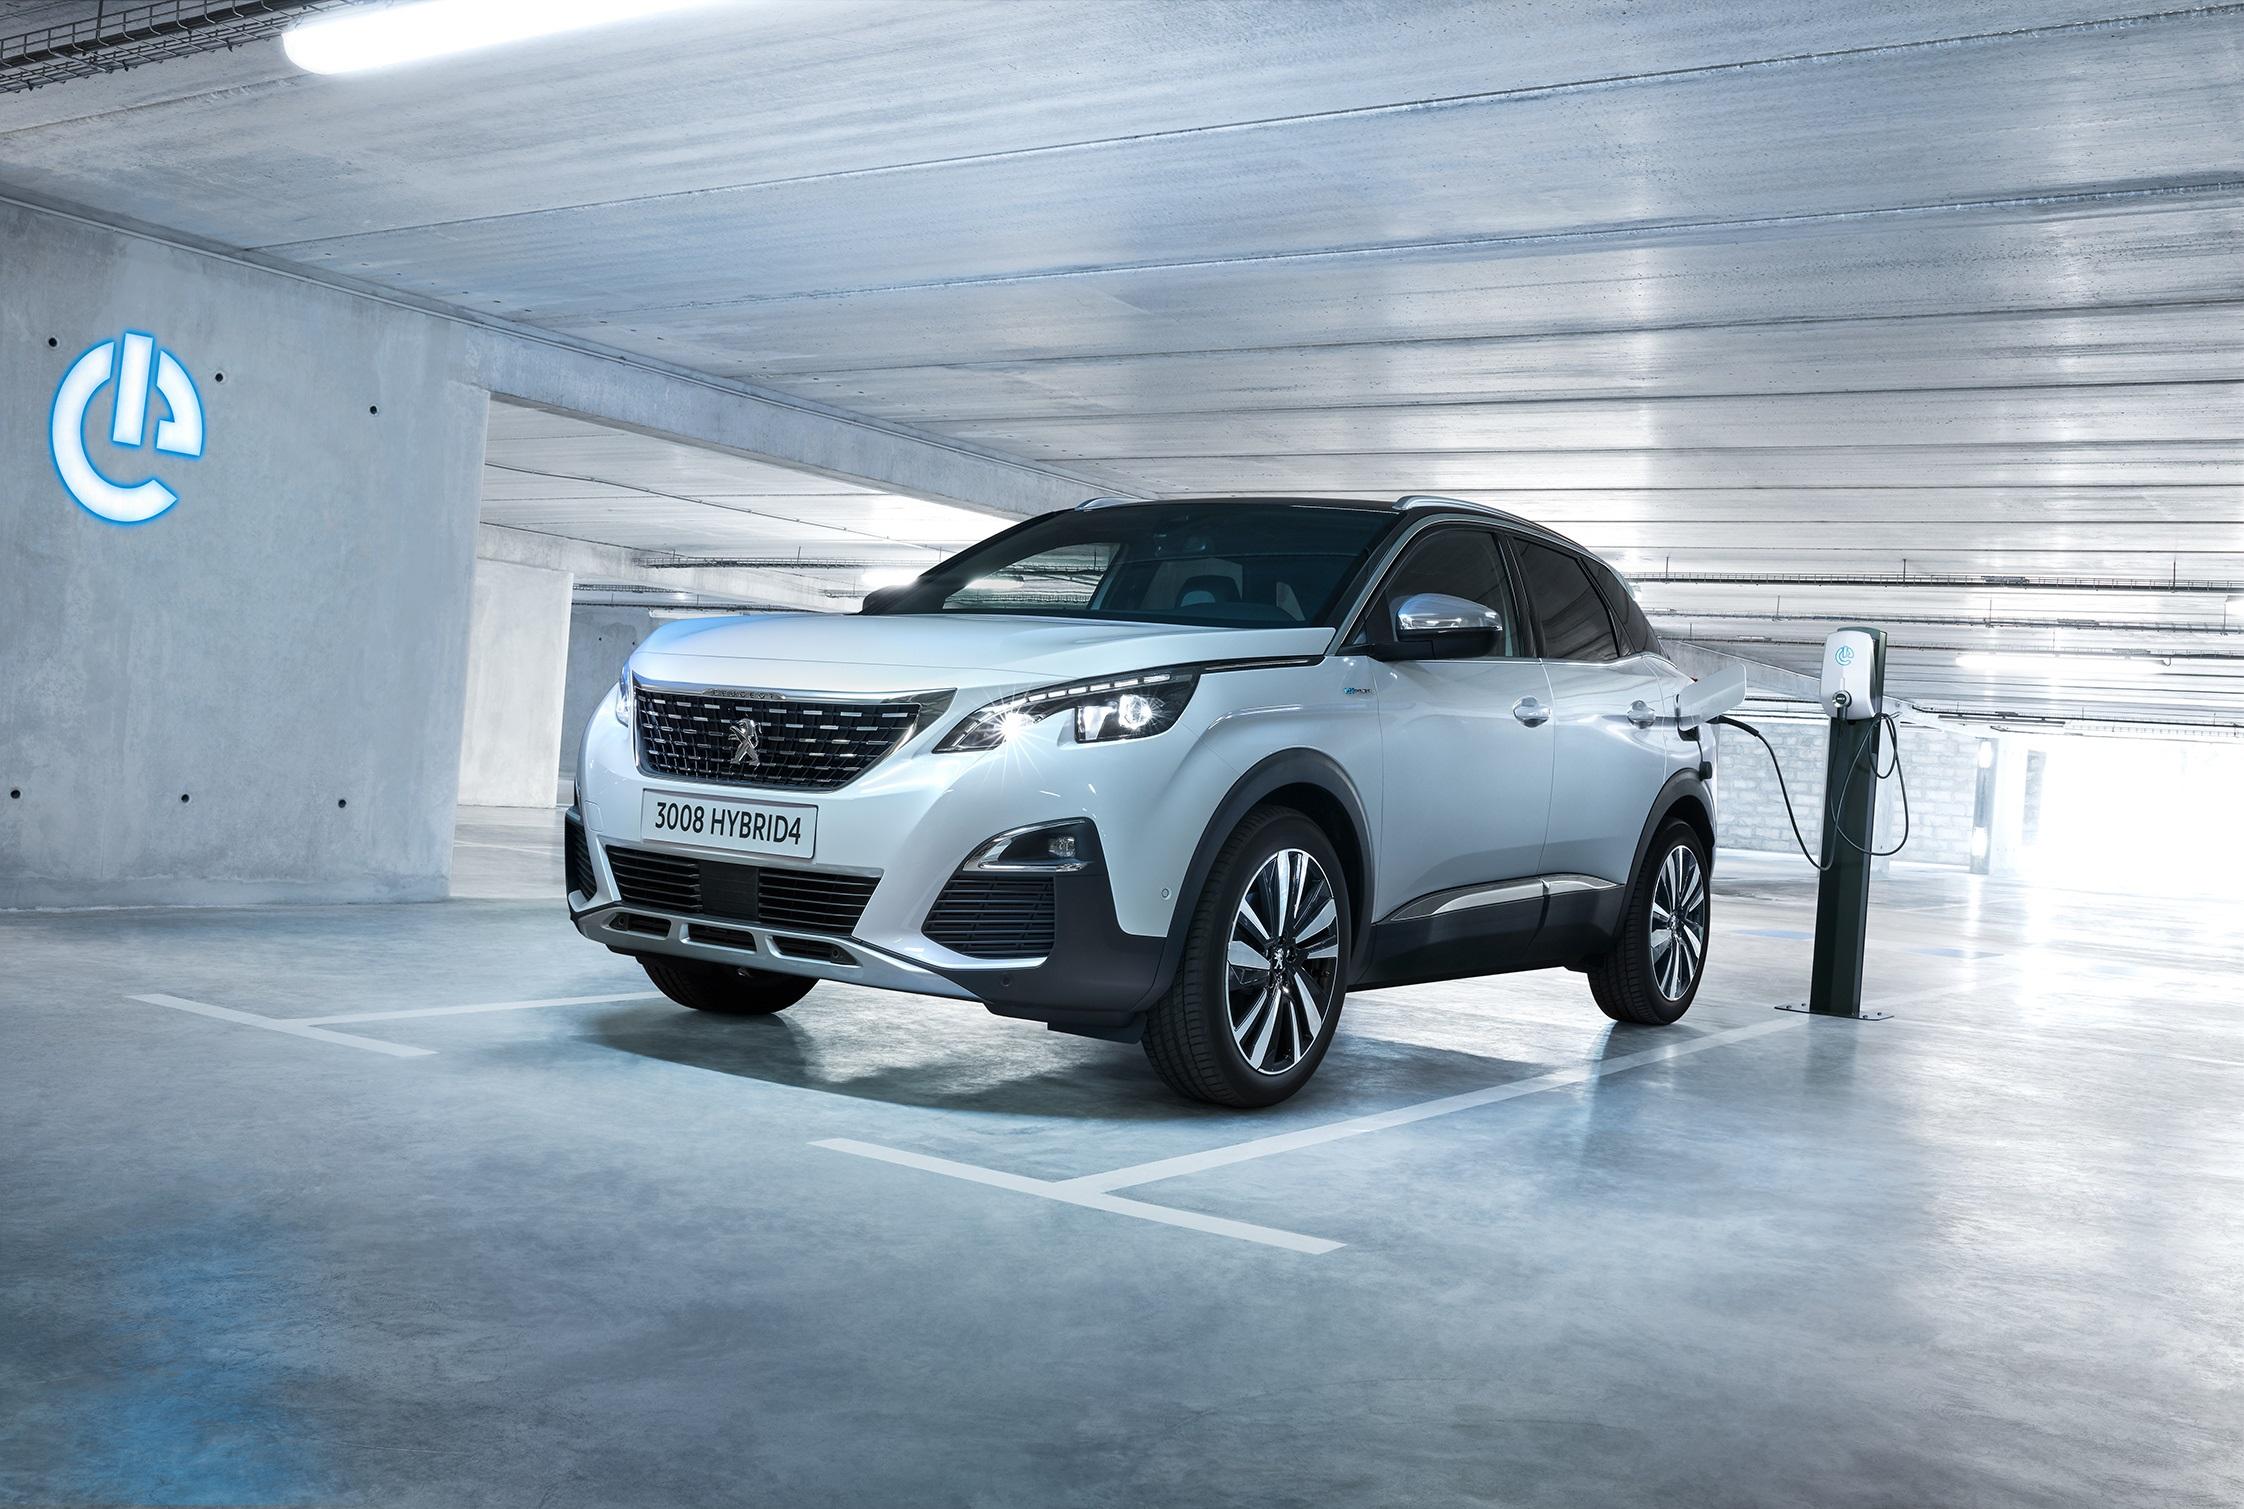 Peugeot abre encomendas para a gama de híbridos Plug-in a partir de 45.125€